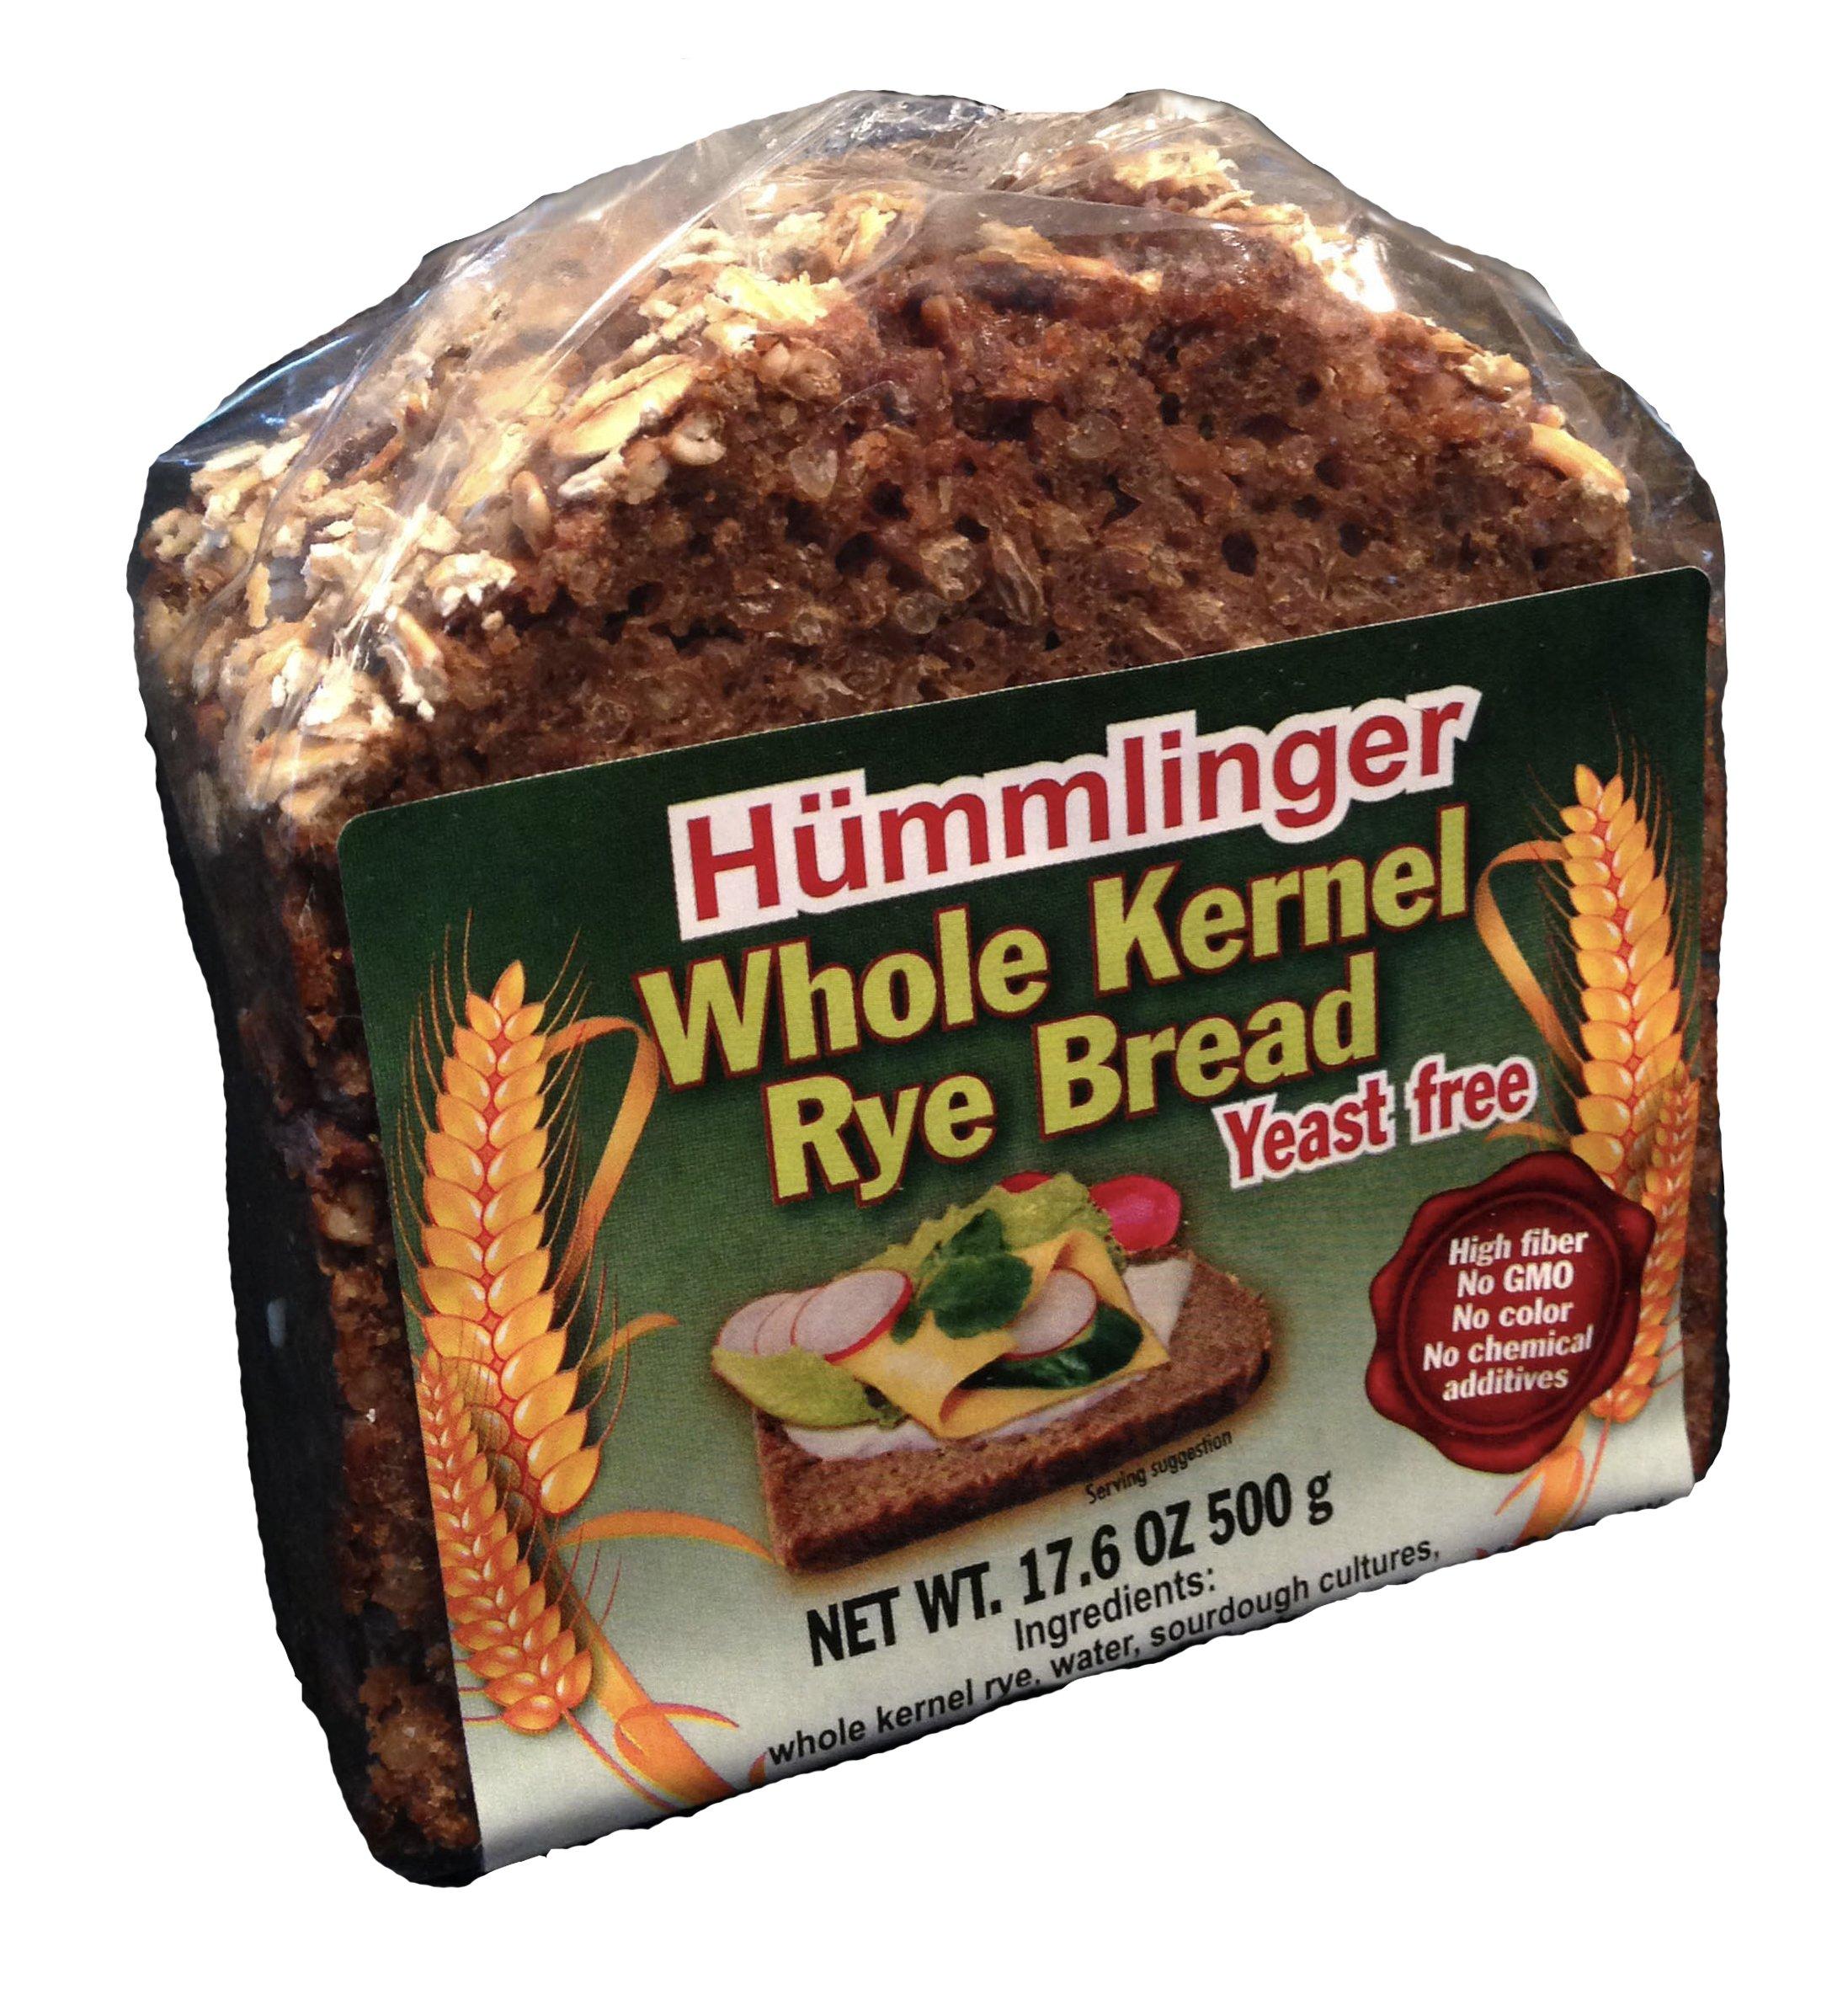 Hummlinger Yeast Free Whole Kernel Rye Bread, GMO FREE 17.6 oz (6 packs)